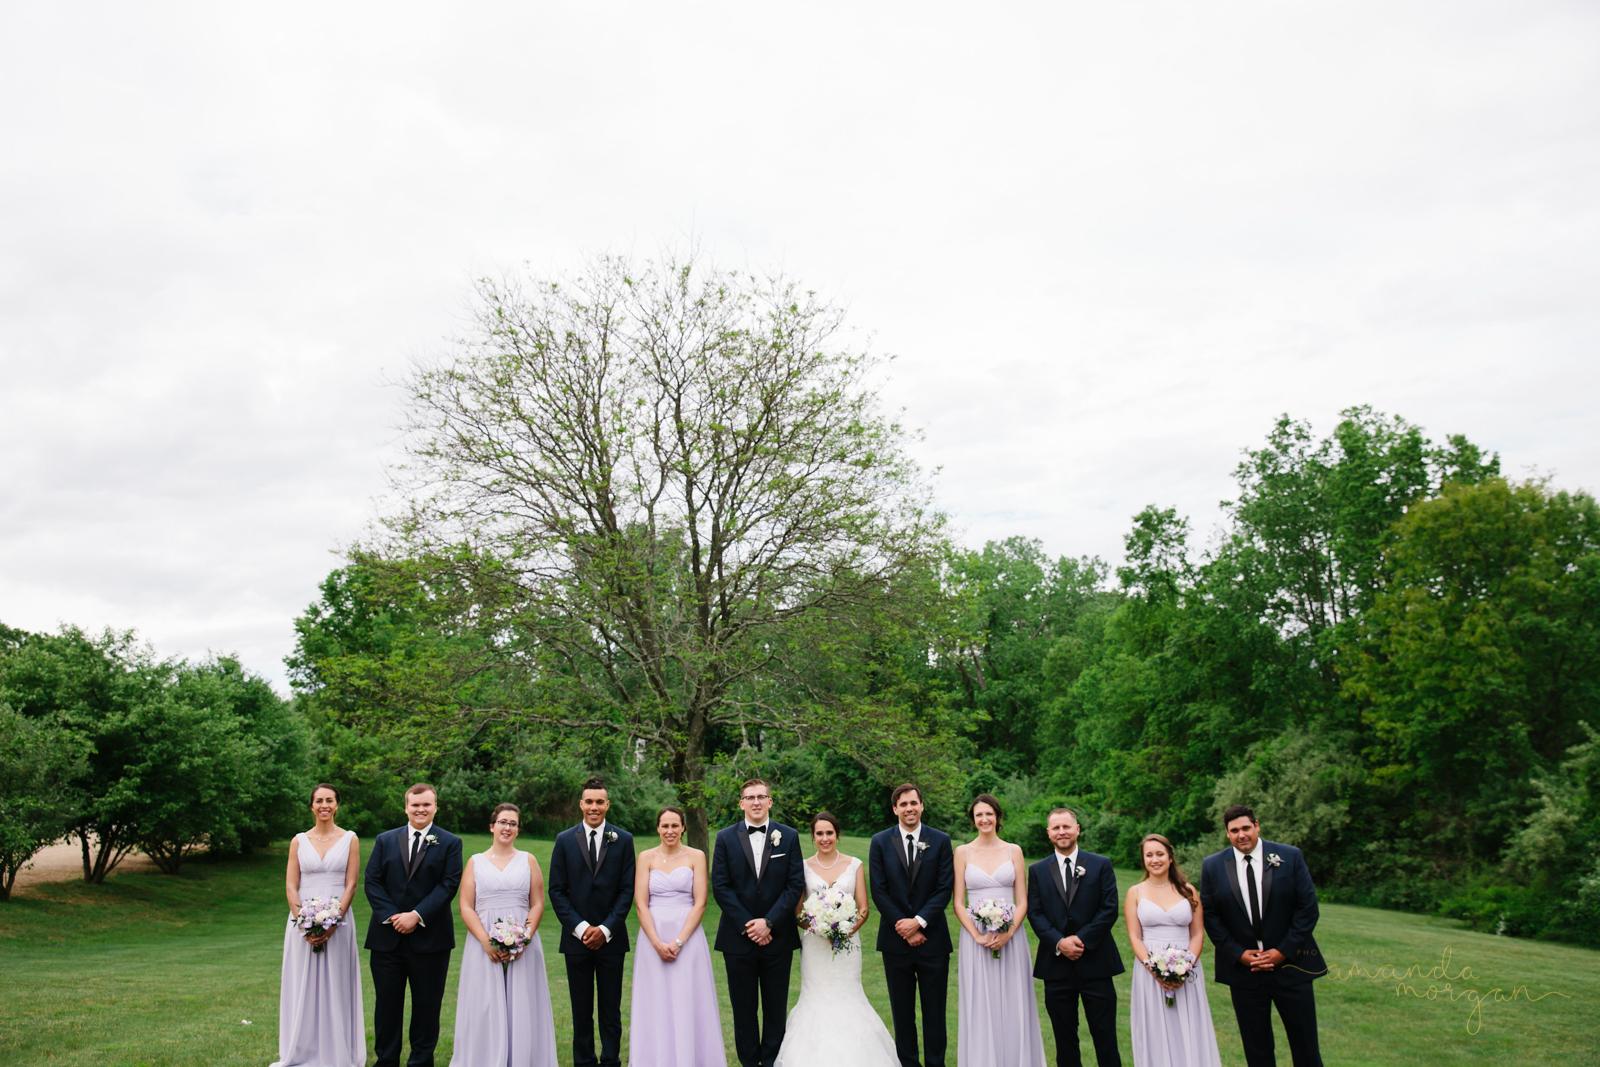 Publick-House-Wedding-Amanda-Morgan-45.jpg